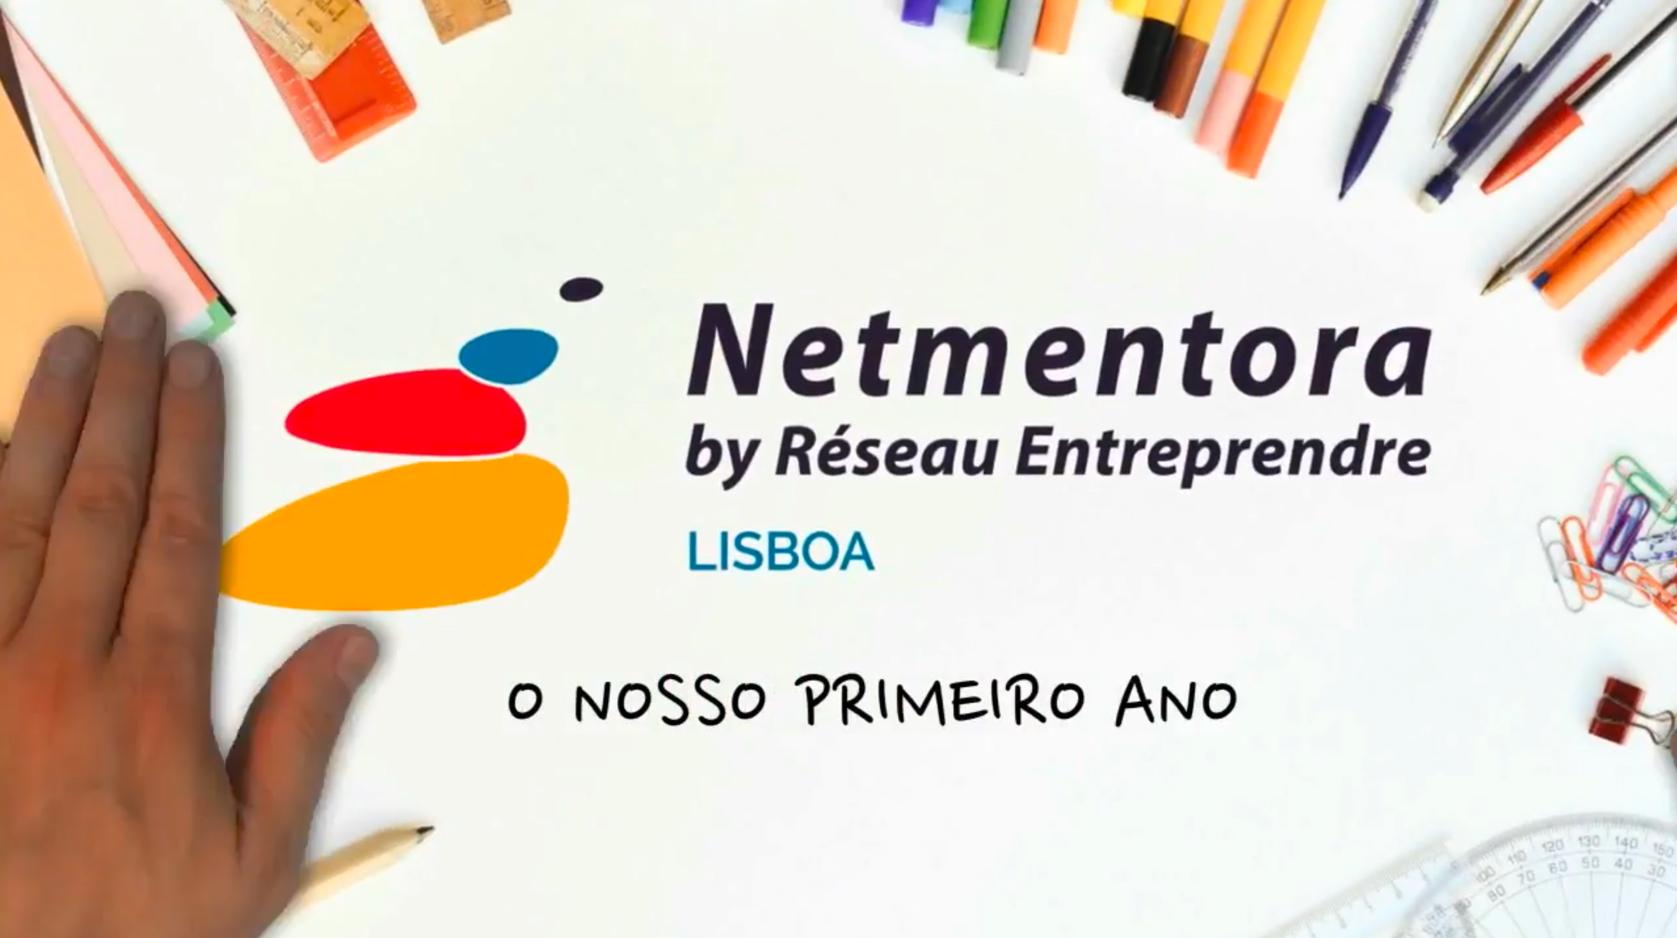 2B-On at Netmentora